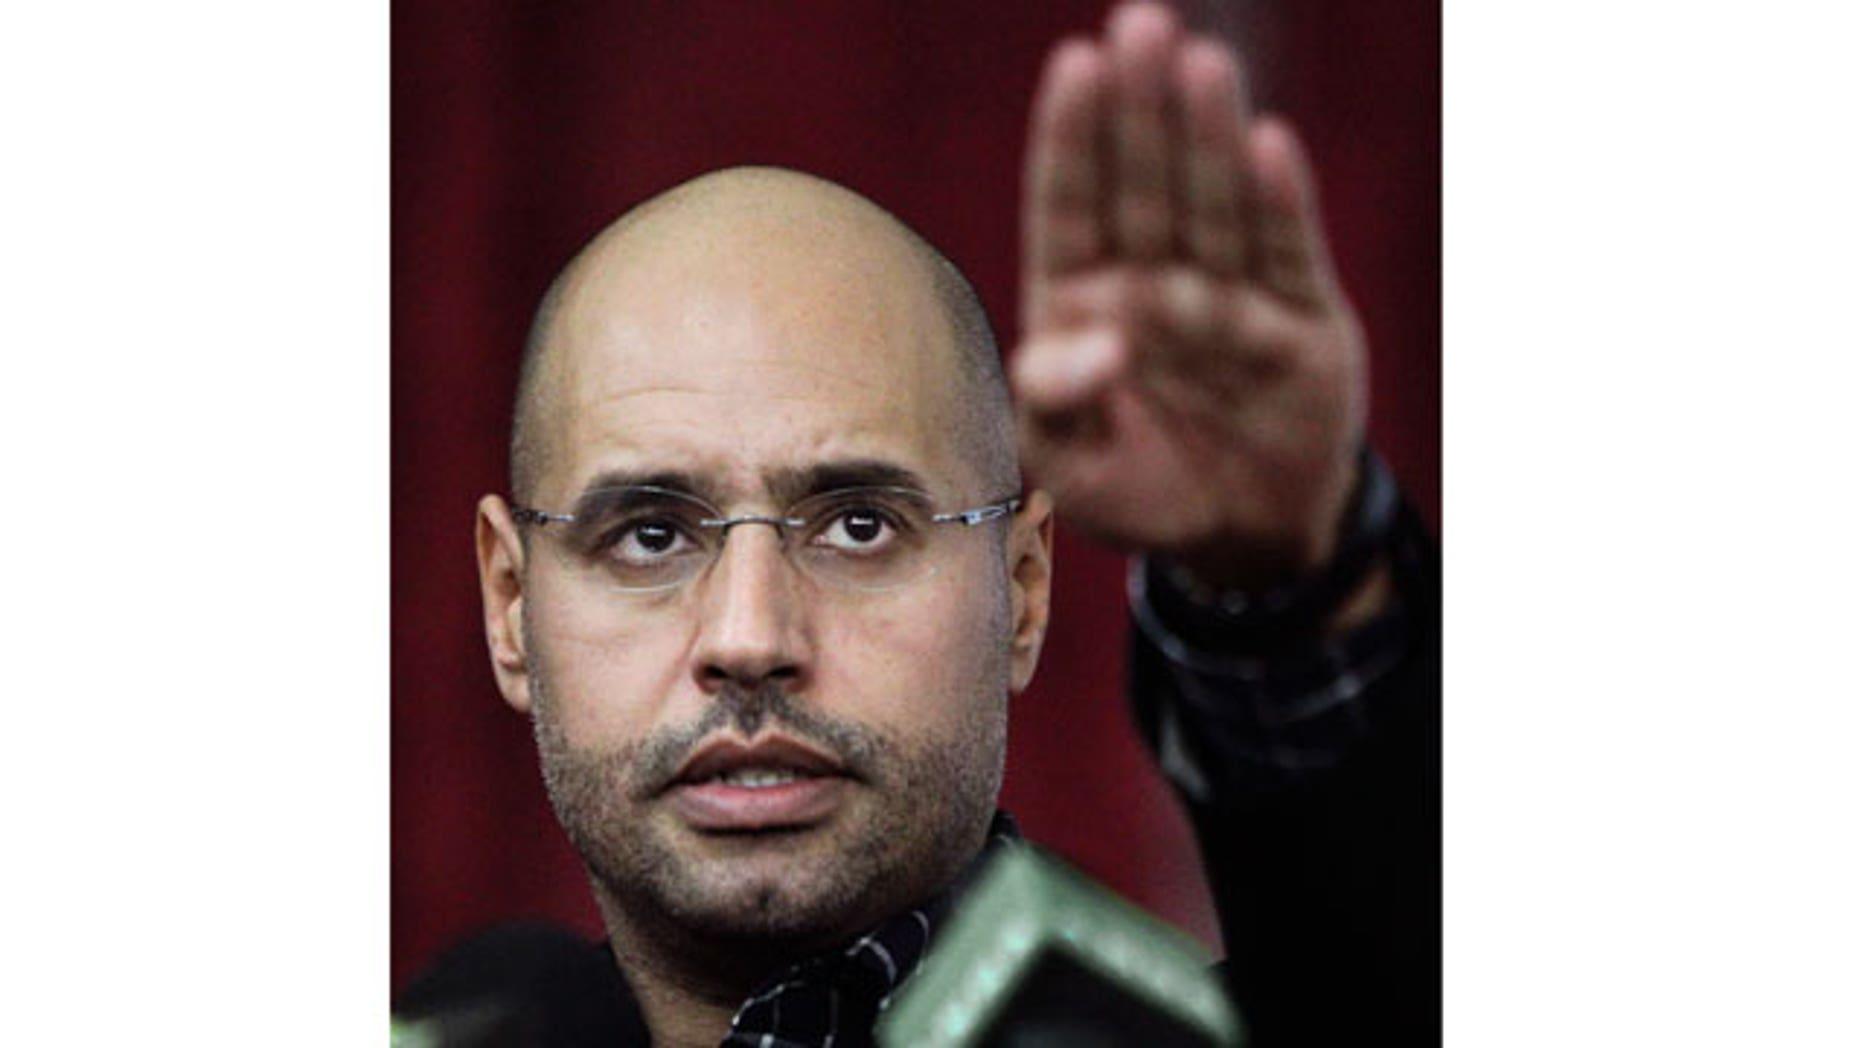 March 10, 2011: Seif al-Islam Qaddafi, son of Libyan leader Muammar Qaddafi, gestures as he speaks to supporters and the media in Tripoli, Libya.